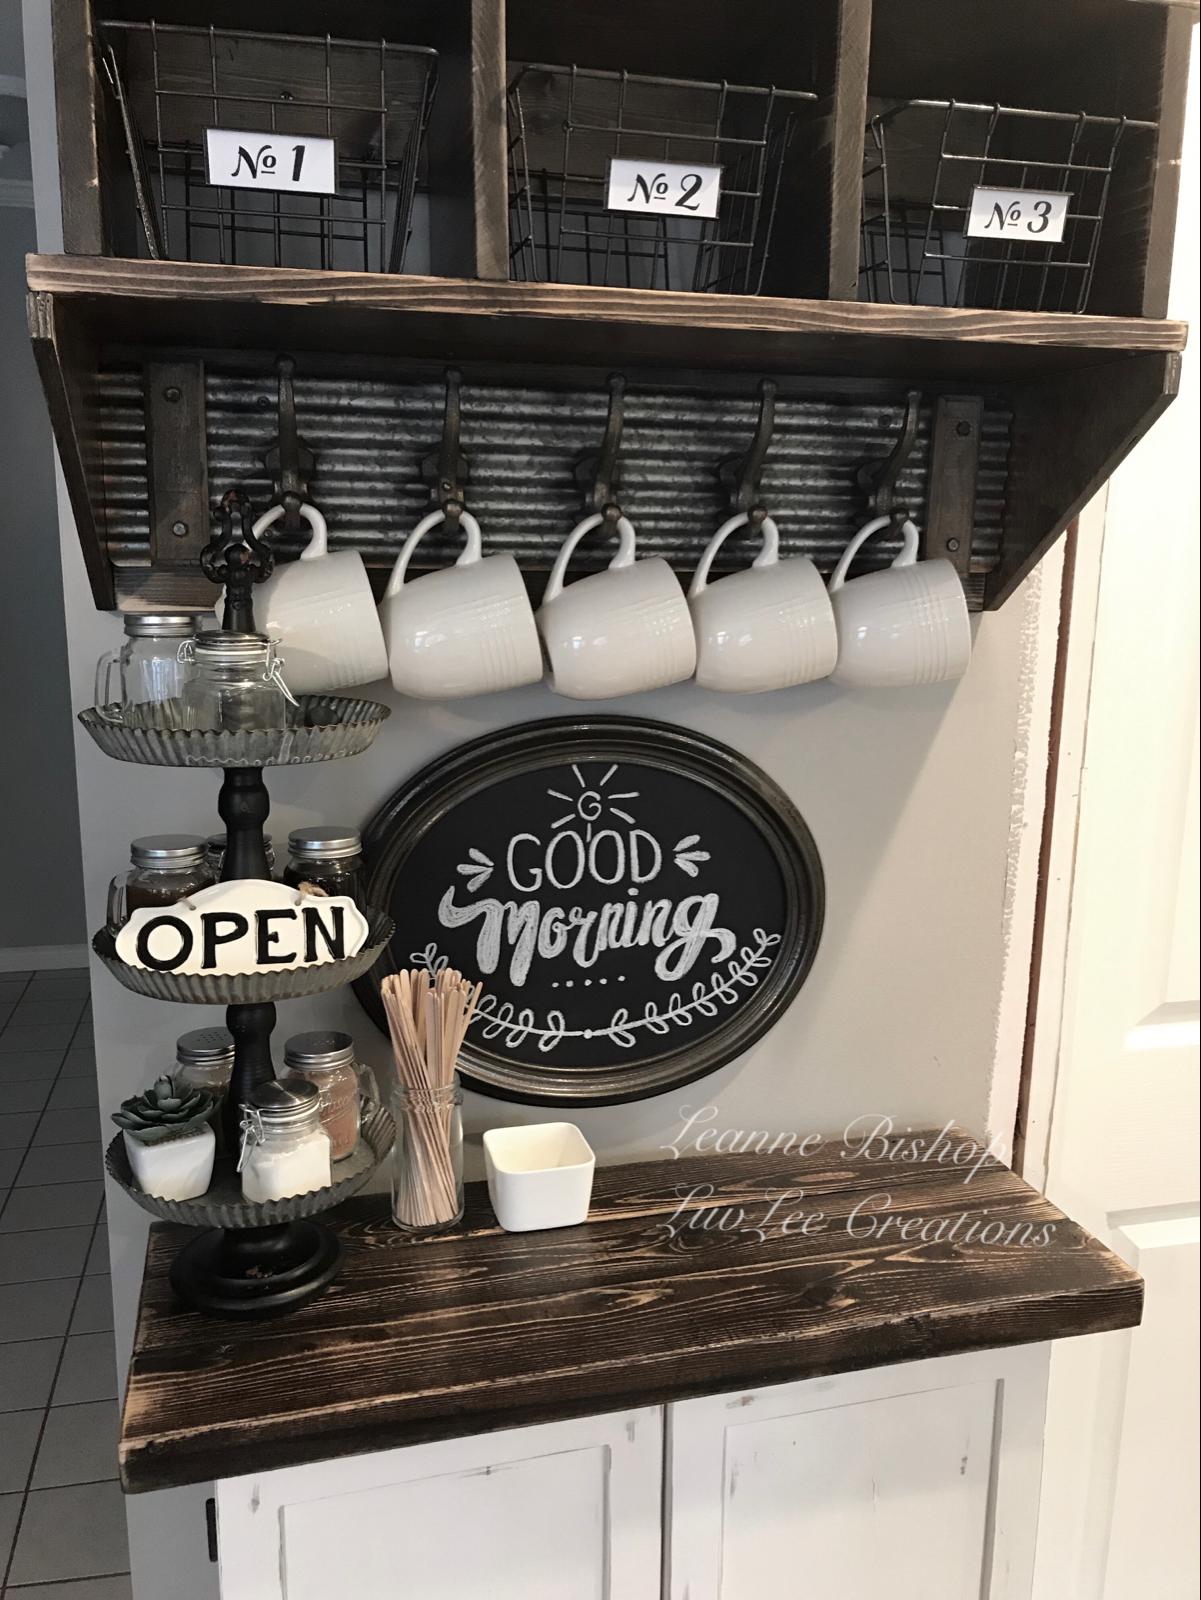 10 Diy Coffee Bar Cabinet Ideas For The Perfect Cup Of Joe Coffeebarideas Rustic Farmhouse Coffee Bar Cabinet With Dark Diy Kaffeebar Kaffeestation Kaffeeecke